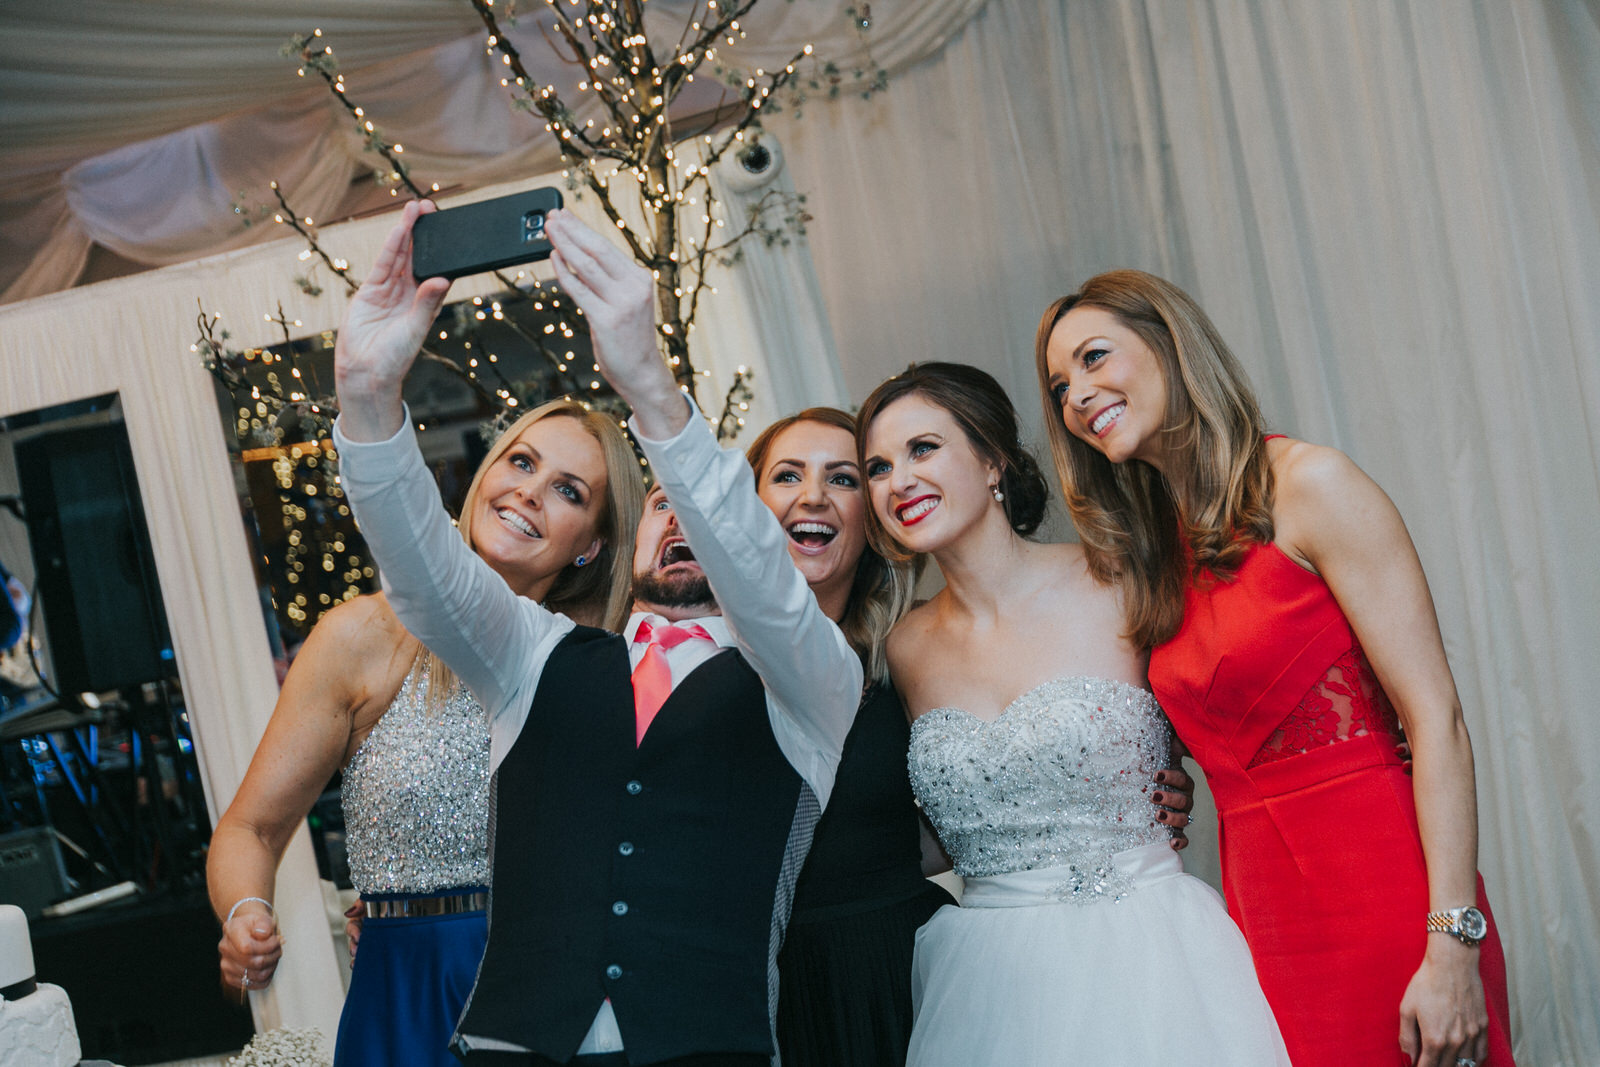 Clonabreany_wedding-photographer_roger_kenny_ireland_116.jpg